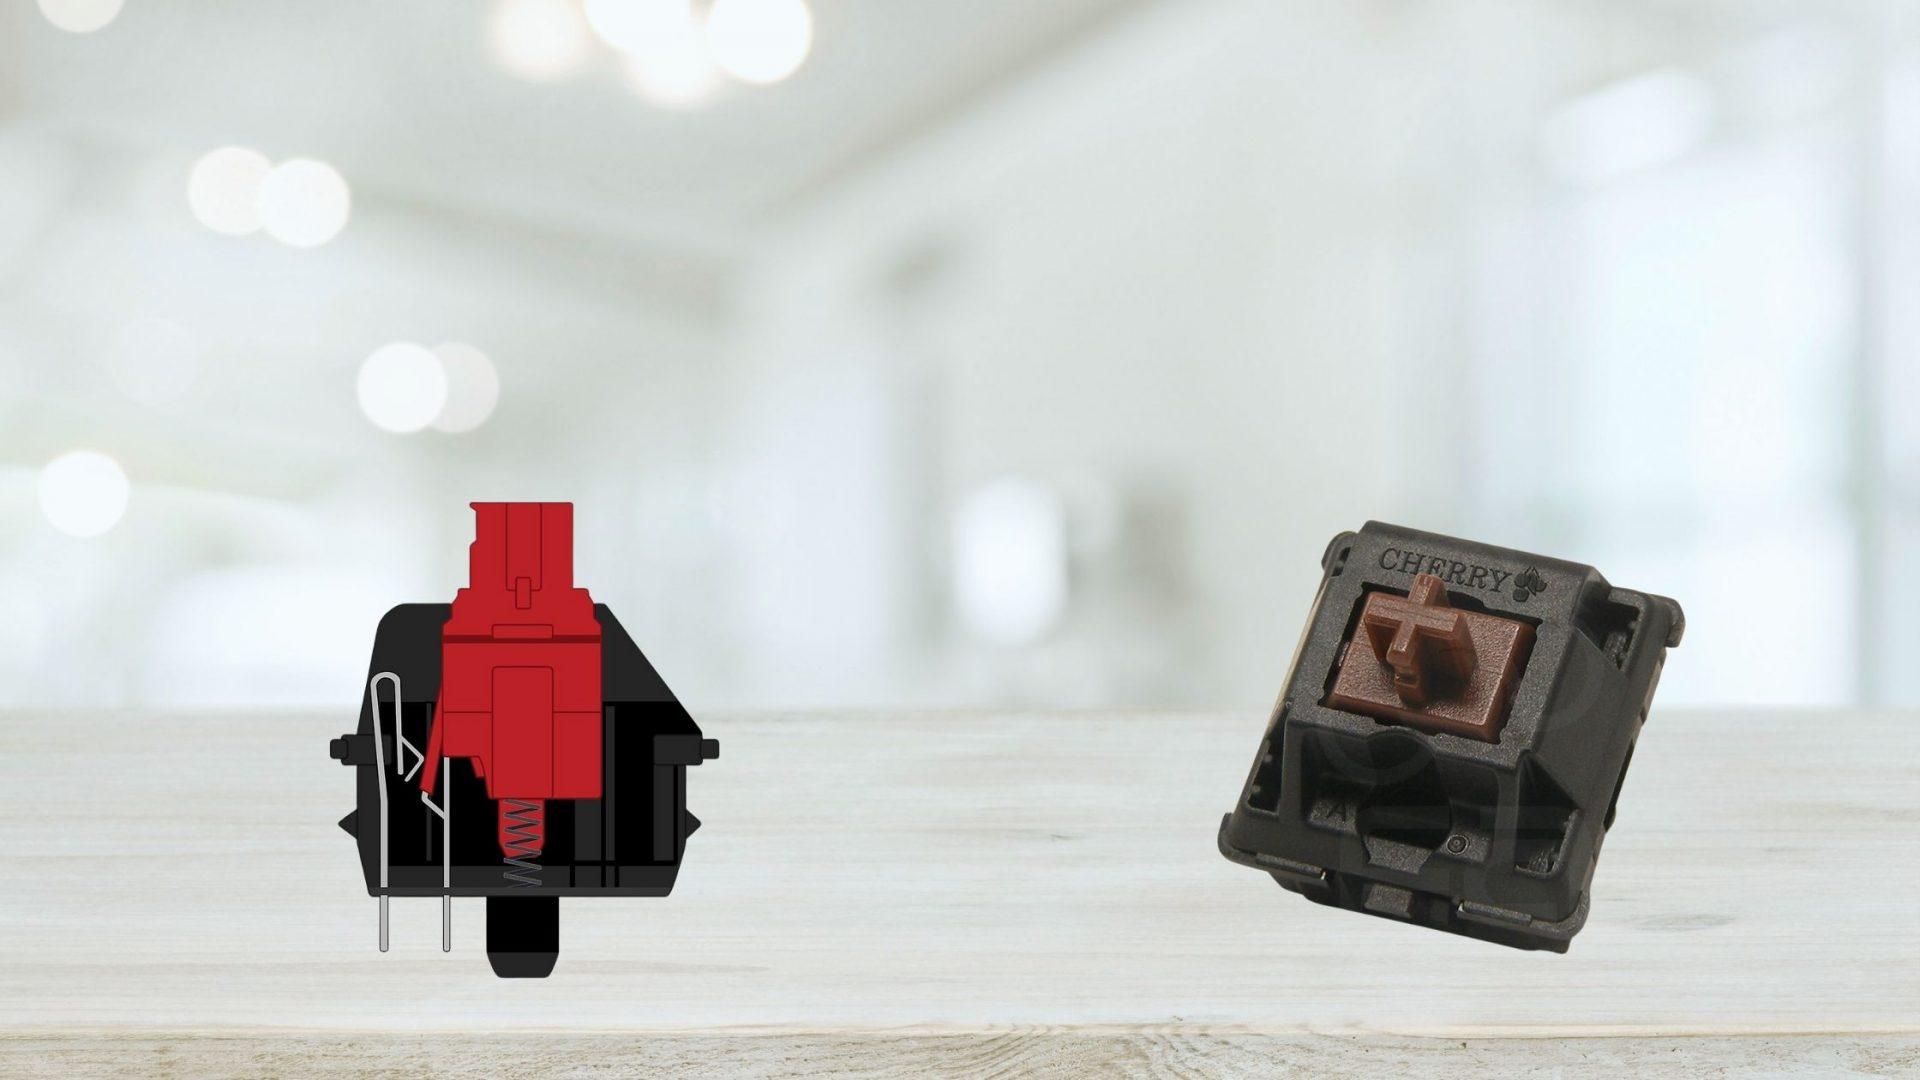 Cherry MX RED vs Brown